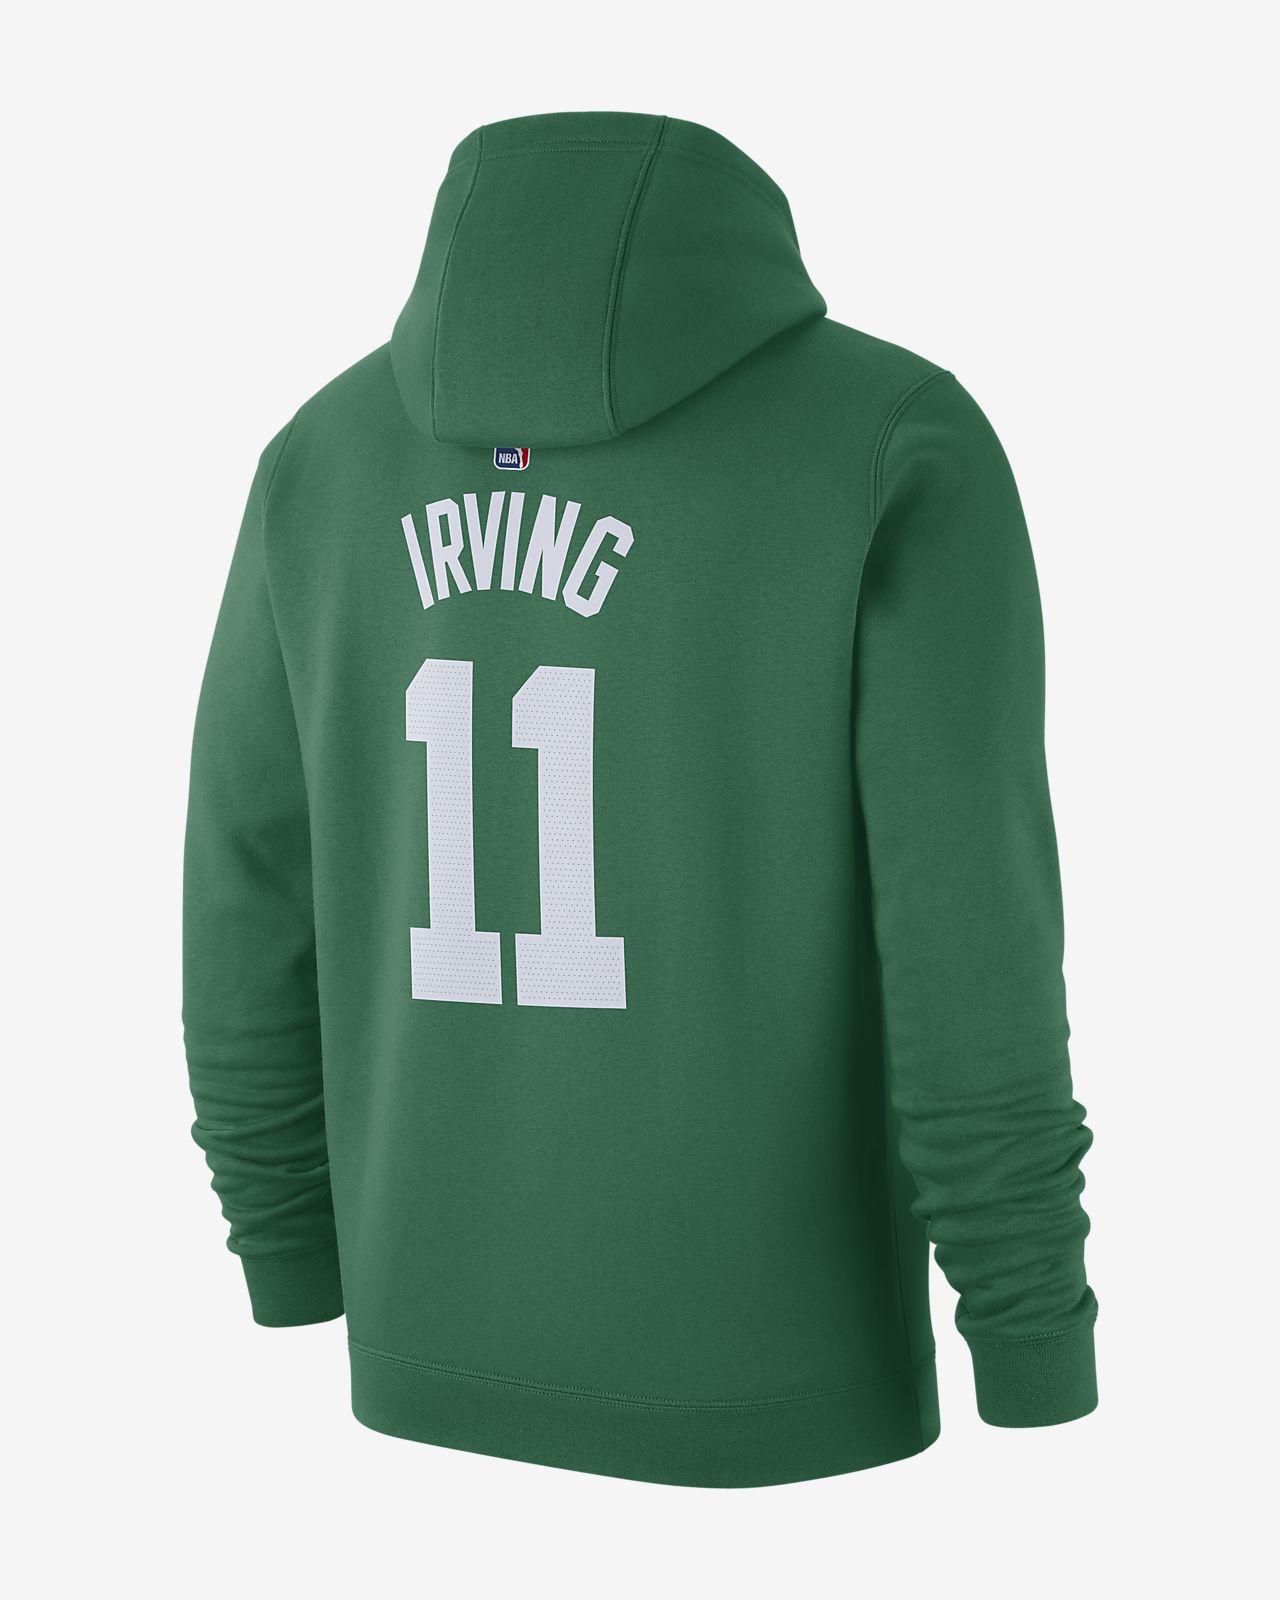 świetna jakość nowe tanie sklep Męska bluza z kapturem NBA Kyrie Irving Boston Celtics Nike